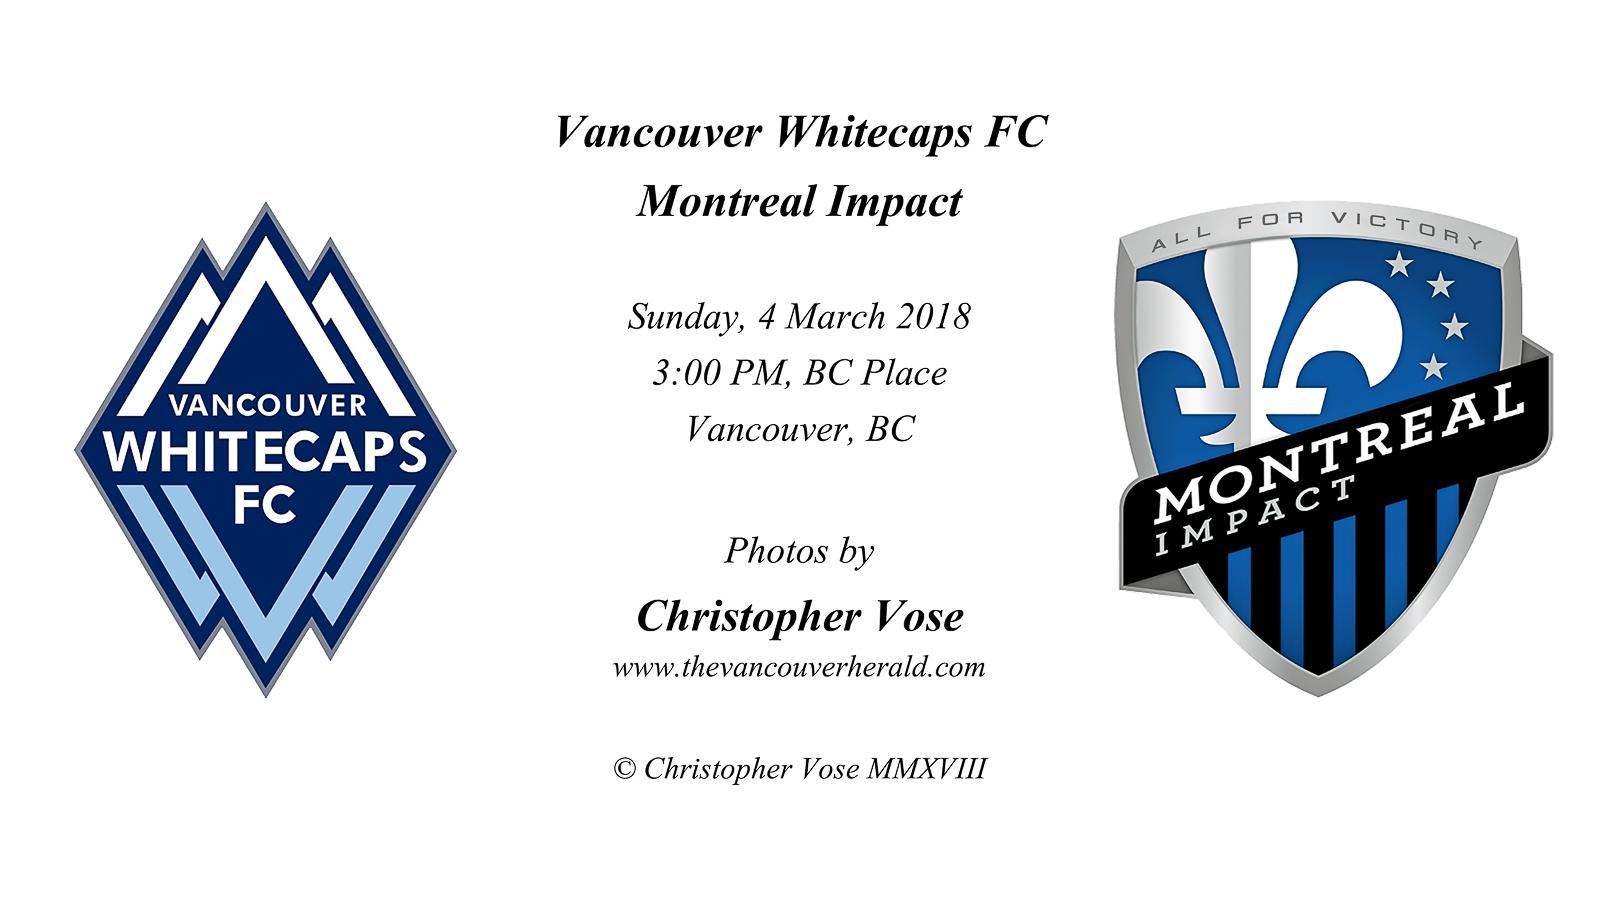 2018-03-04 Vancouver Whitecaps FC v Montreal Impact.jpg